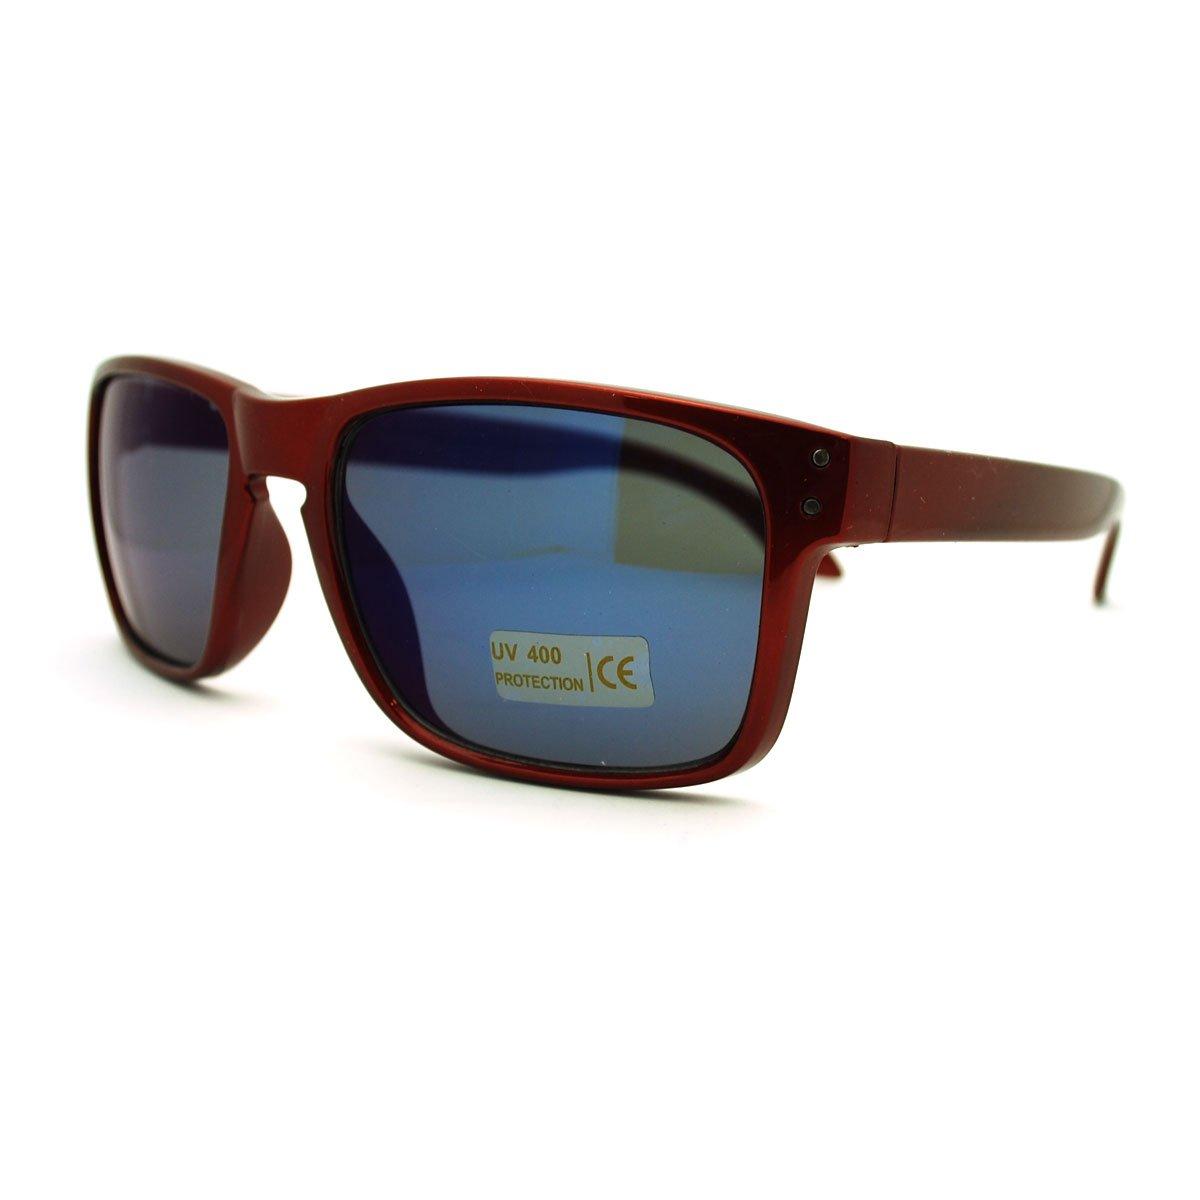 Square Rectangular Sunglasses Mens Classic Fashion Multicolor Revo Lens